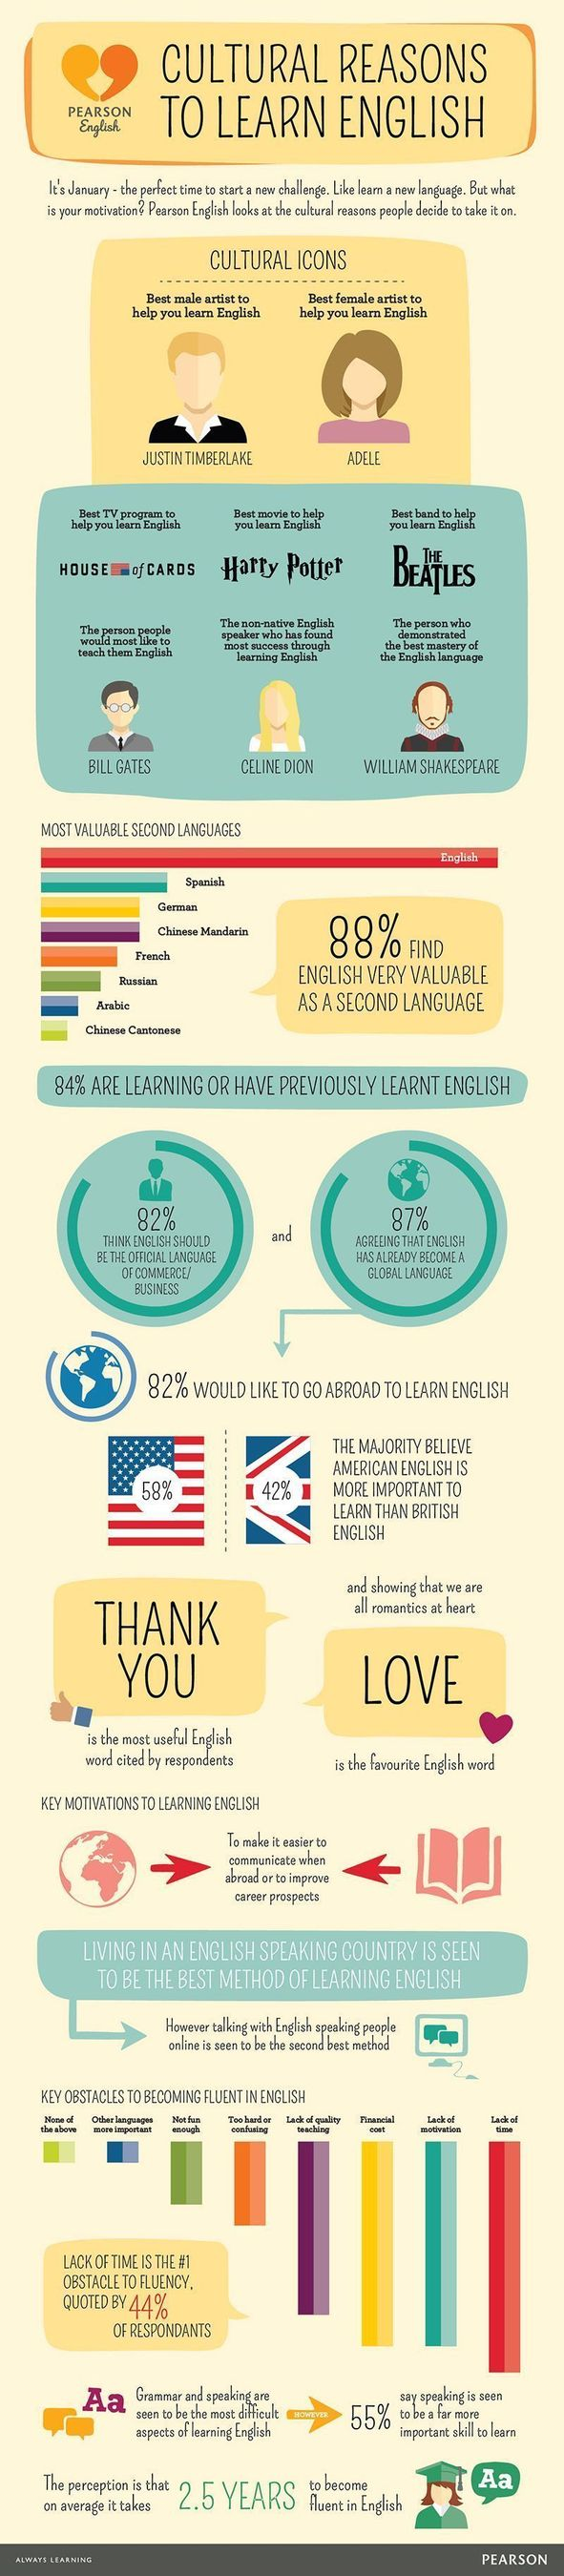 Get Inspired to Learn English (PRNewsFoto/PEARSON English)